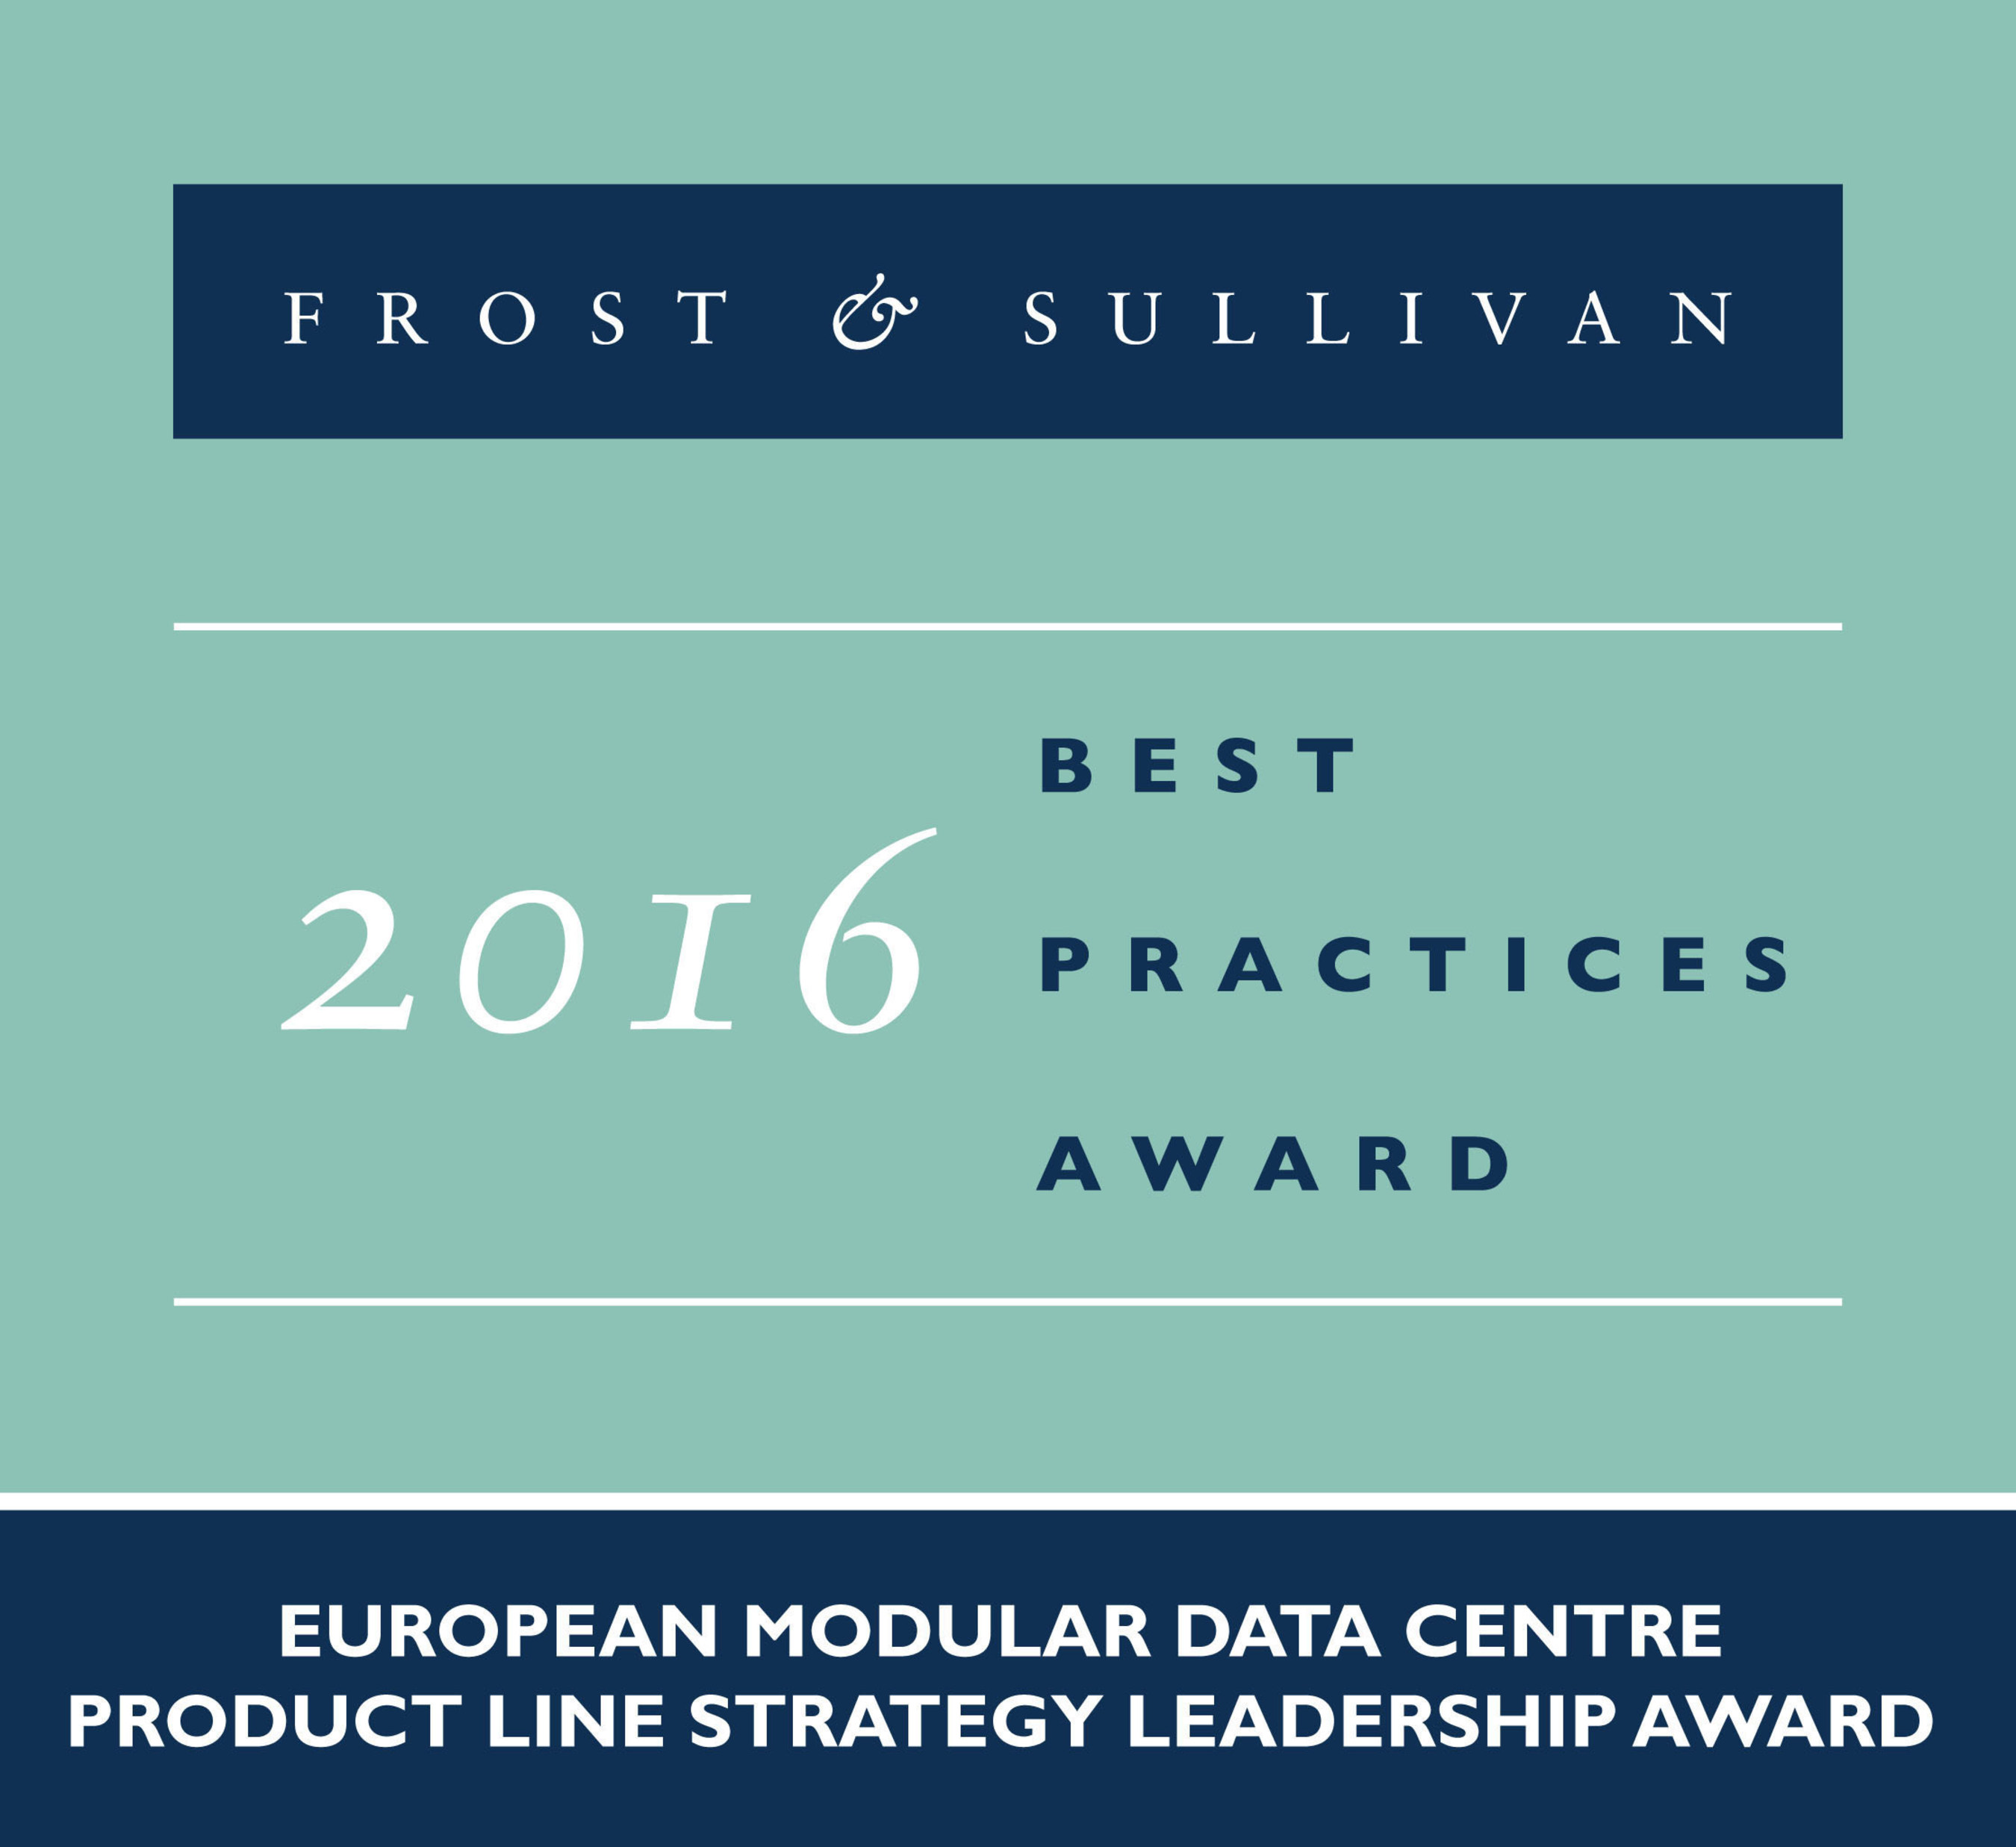 ICTroom Receives 2016 European Modular Data Centre Product Line Strategy Leadership Award